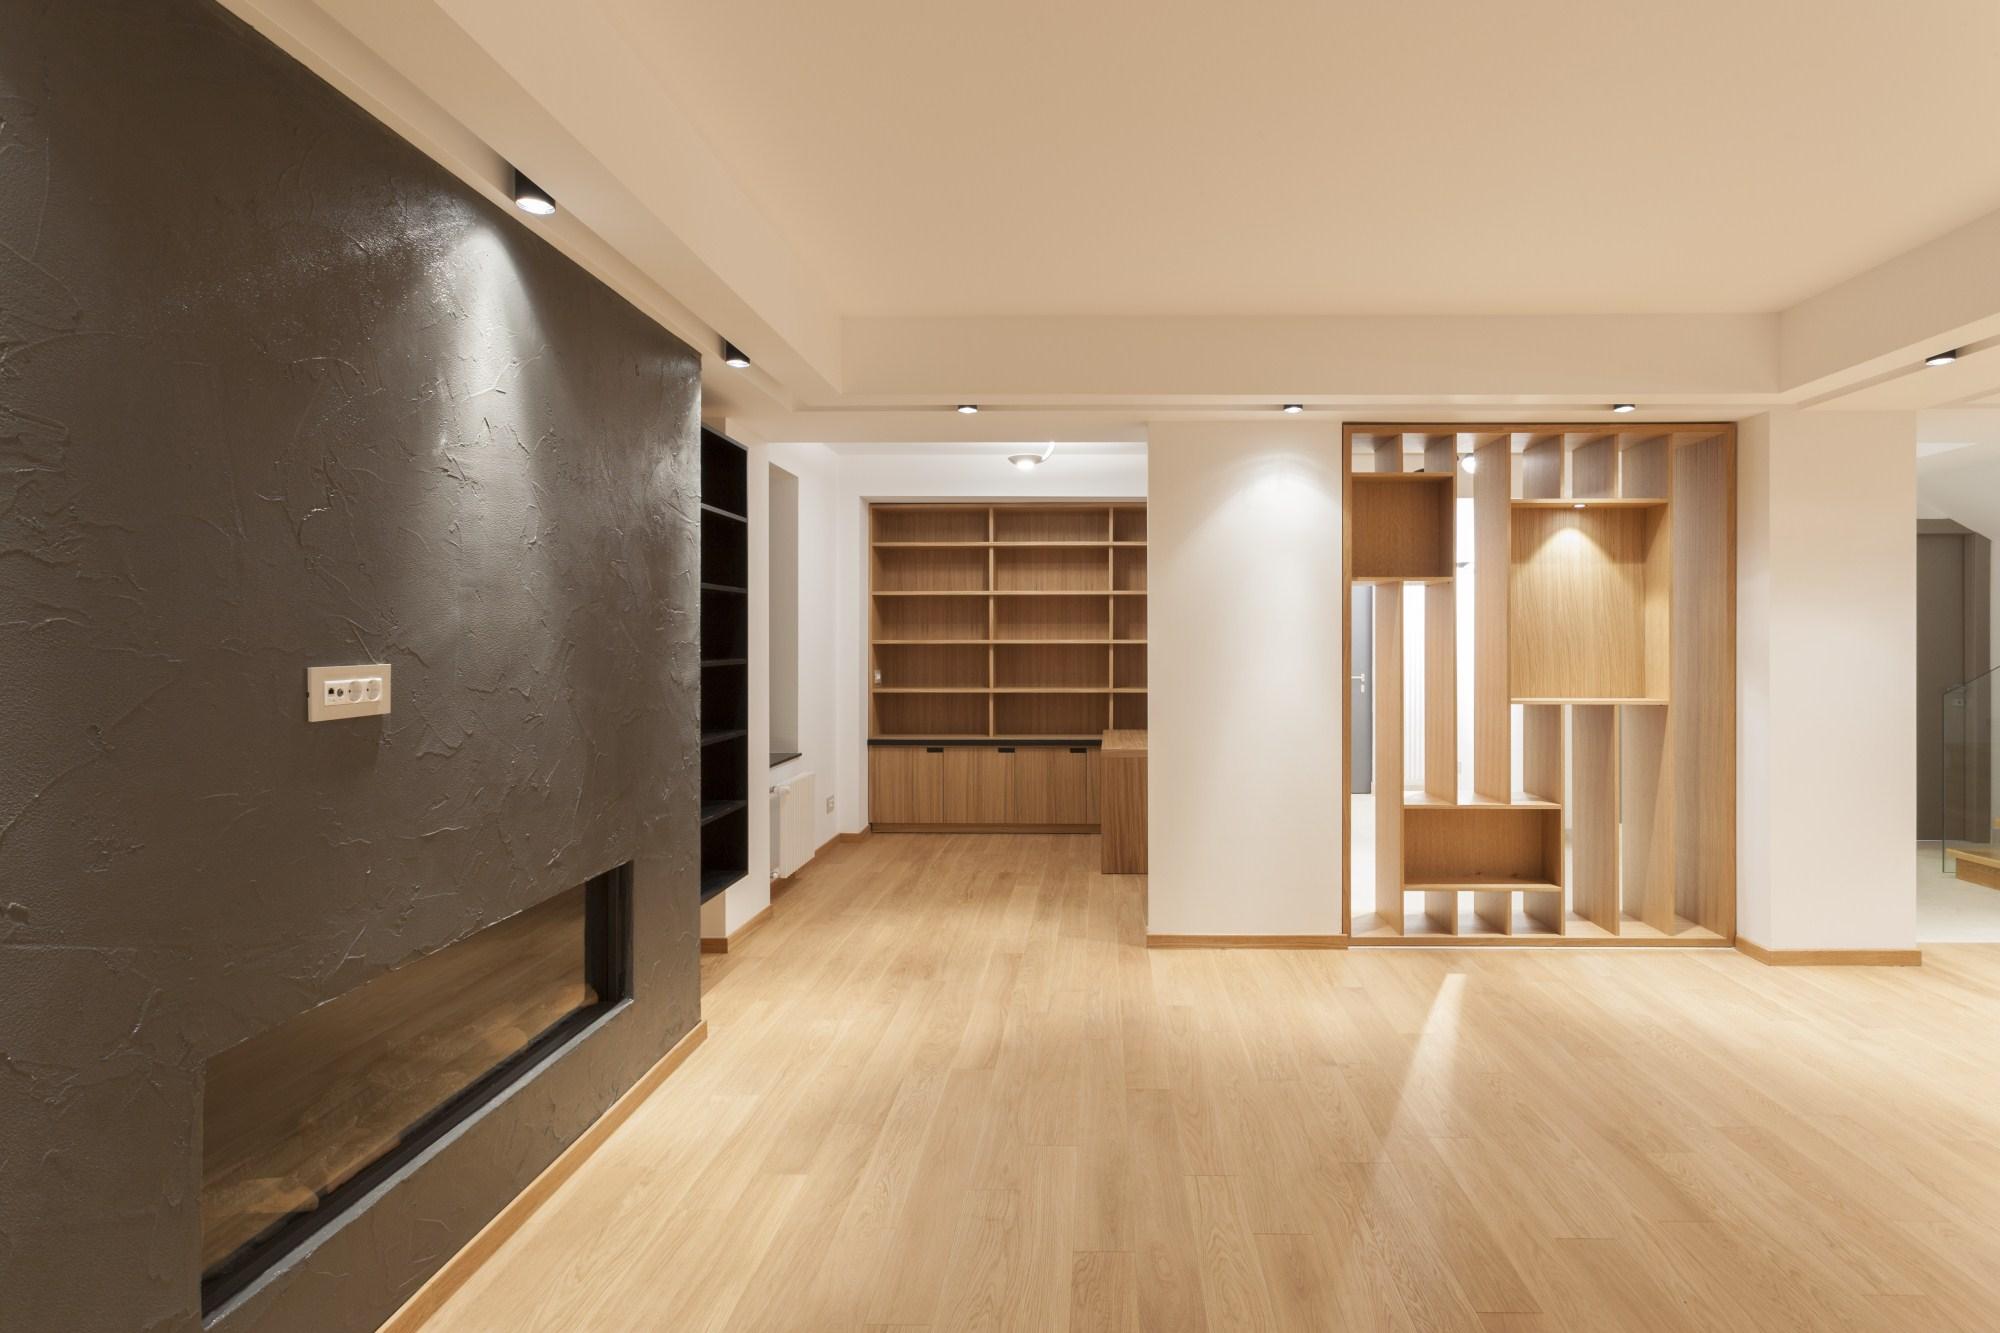 https://nbc-arhitect.ro/wp-content/uploads/2020/10/NBC-Arhitect-_-interiors-_-Vila-Pipera-_-Bucharest-Romania-_-interior-design-view_16.jpg